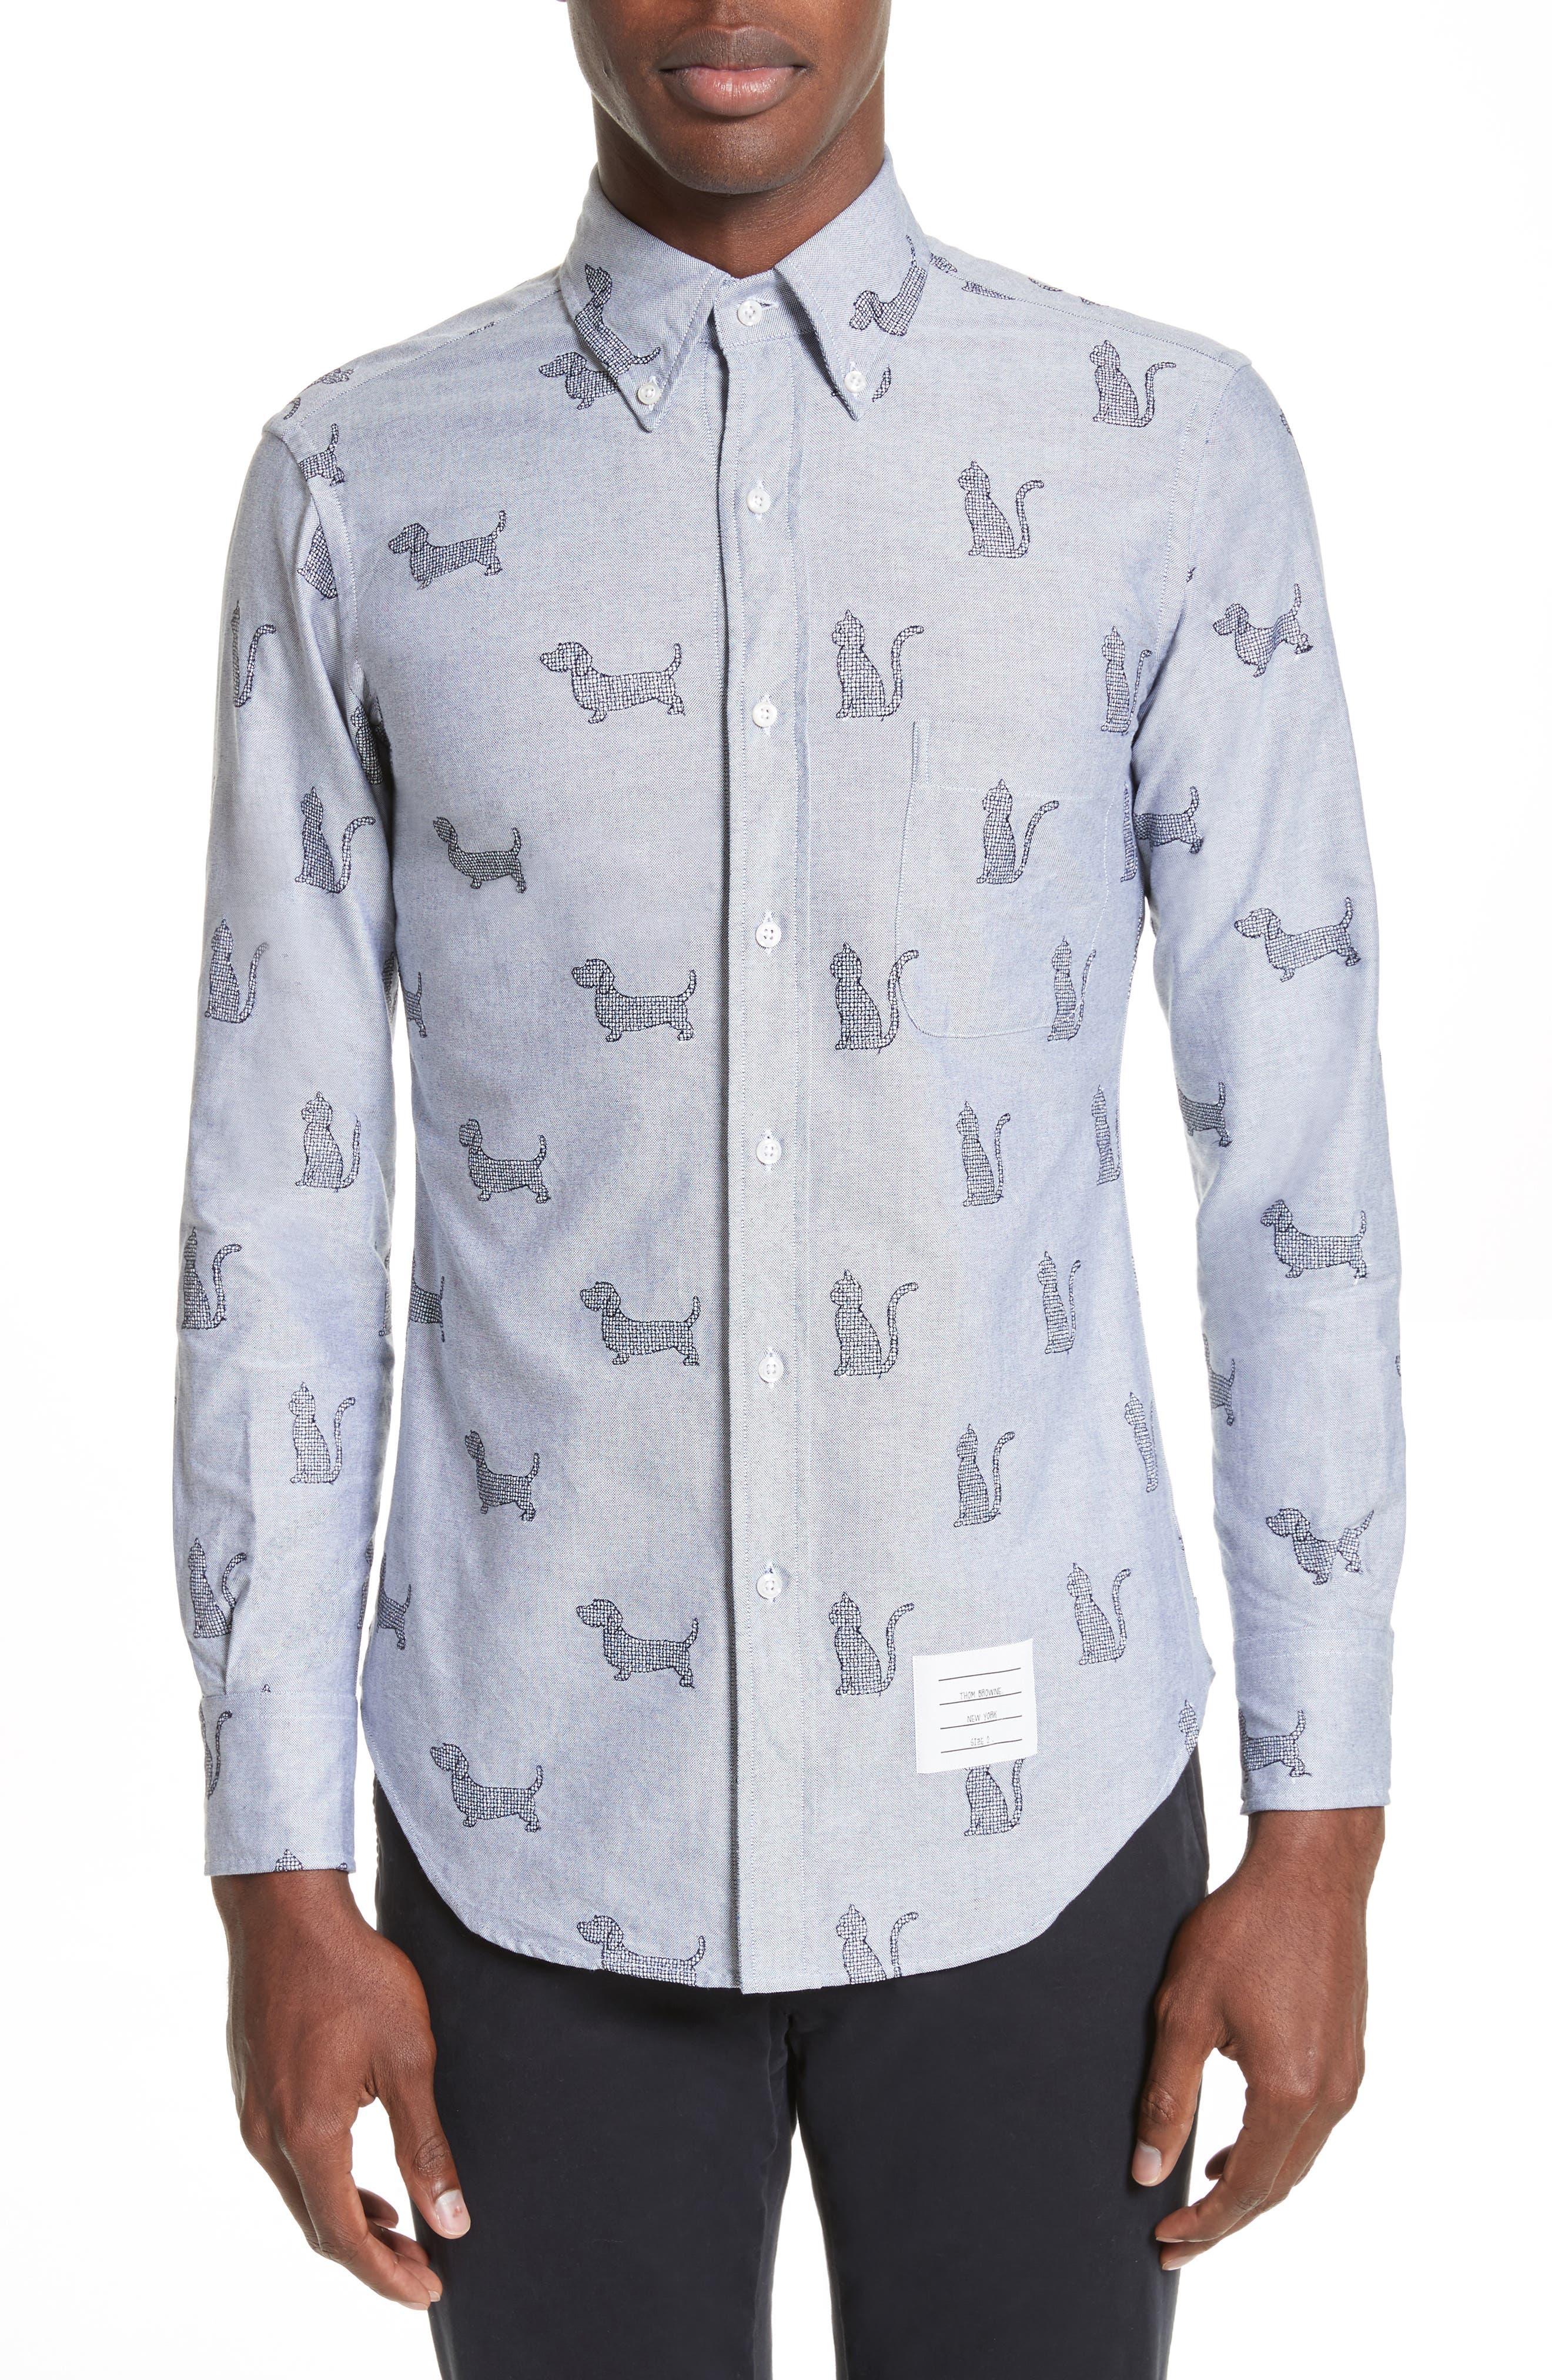 Alternate Image 1 Selected - Thom Browne Daschund Kitty Print Shirt